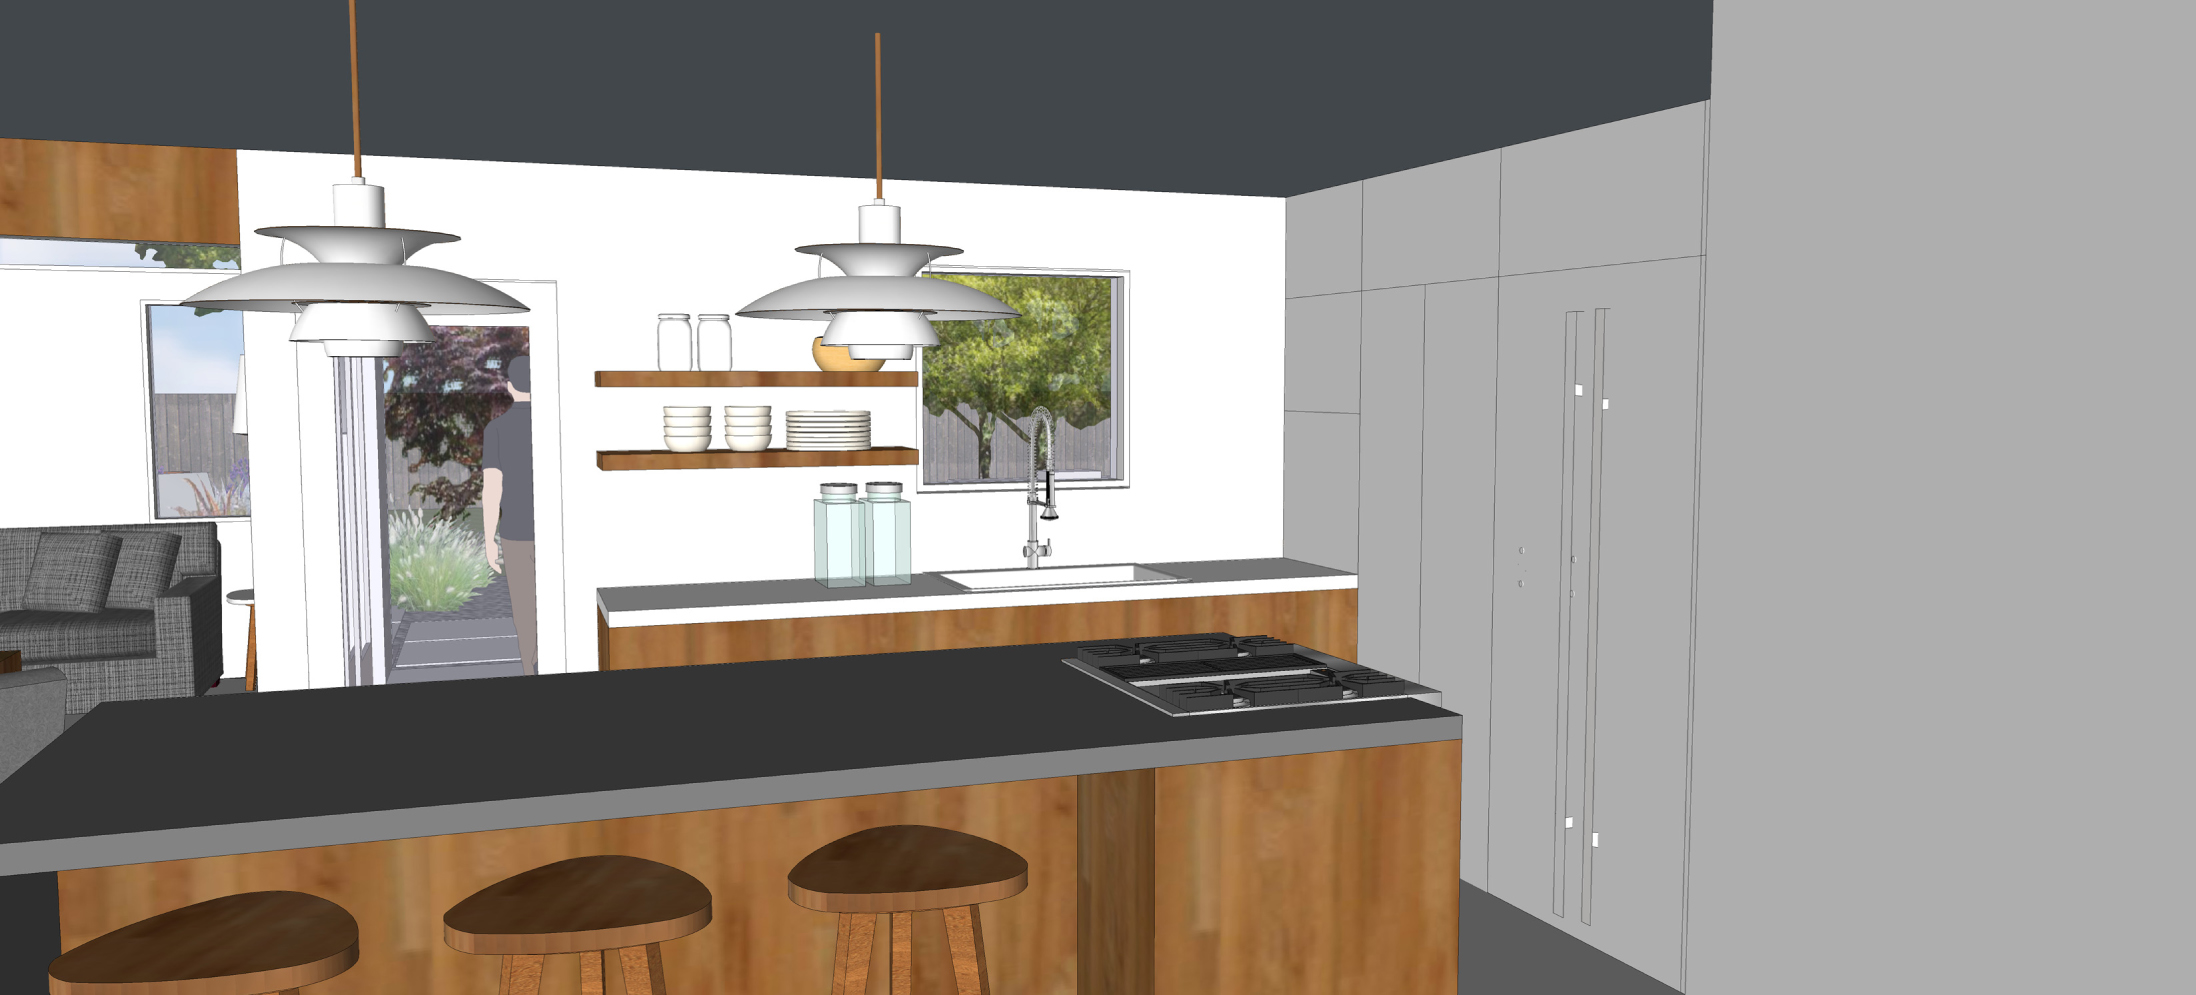 16-0607_S-SADDITION_kitchen.jpg